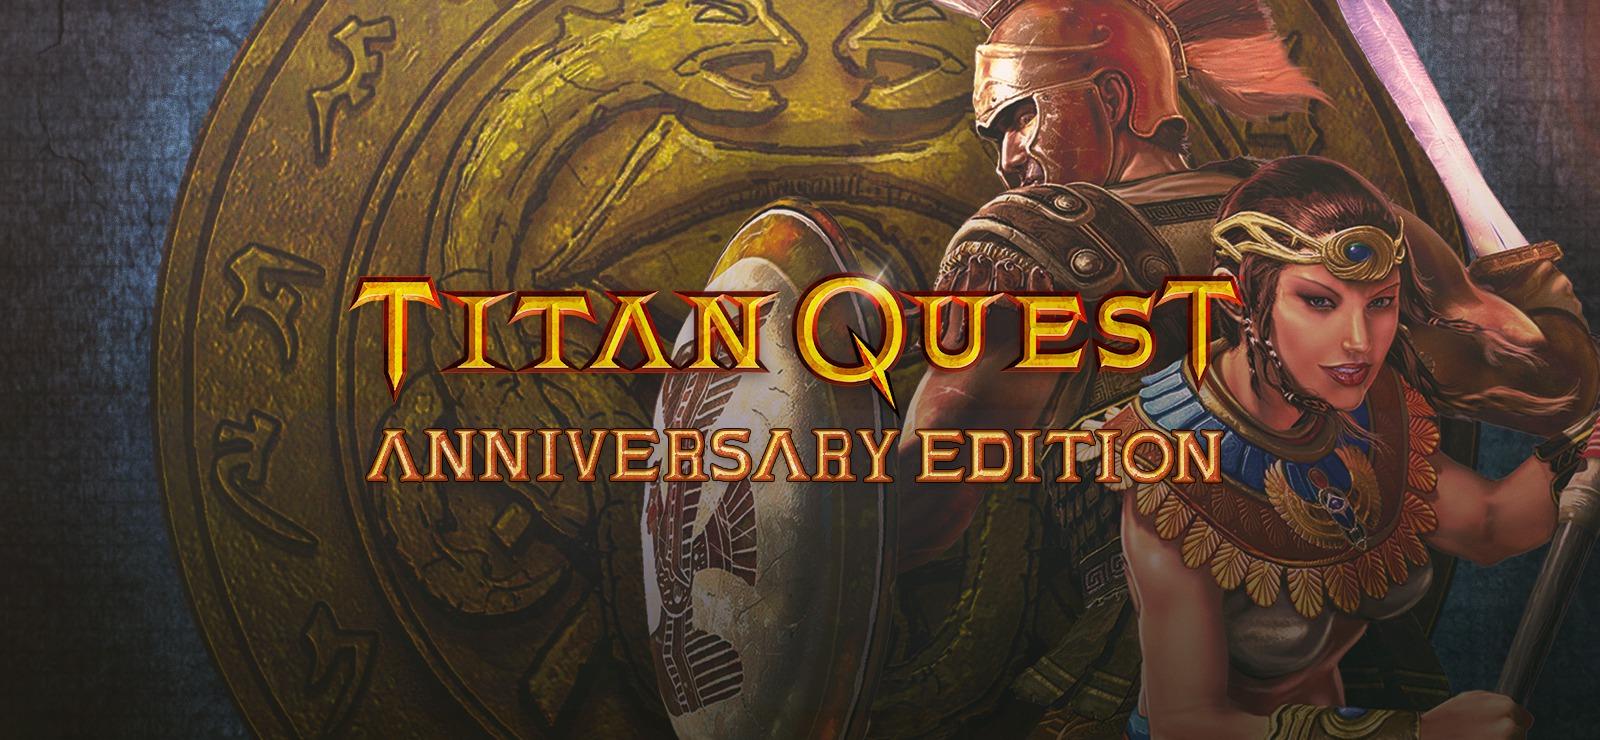 ontslae te raken van Titan Quest Anniversary Edition crash probleem